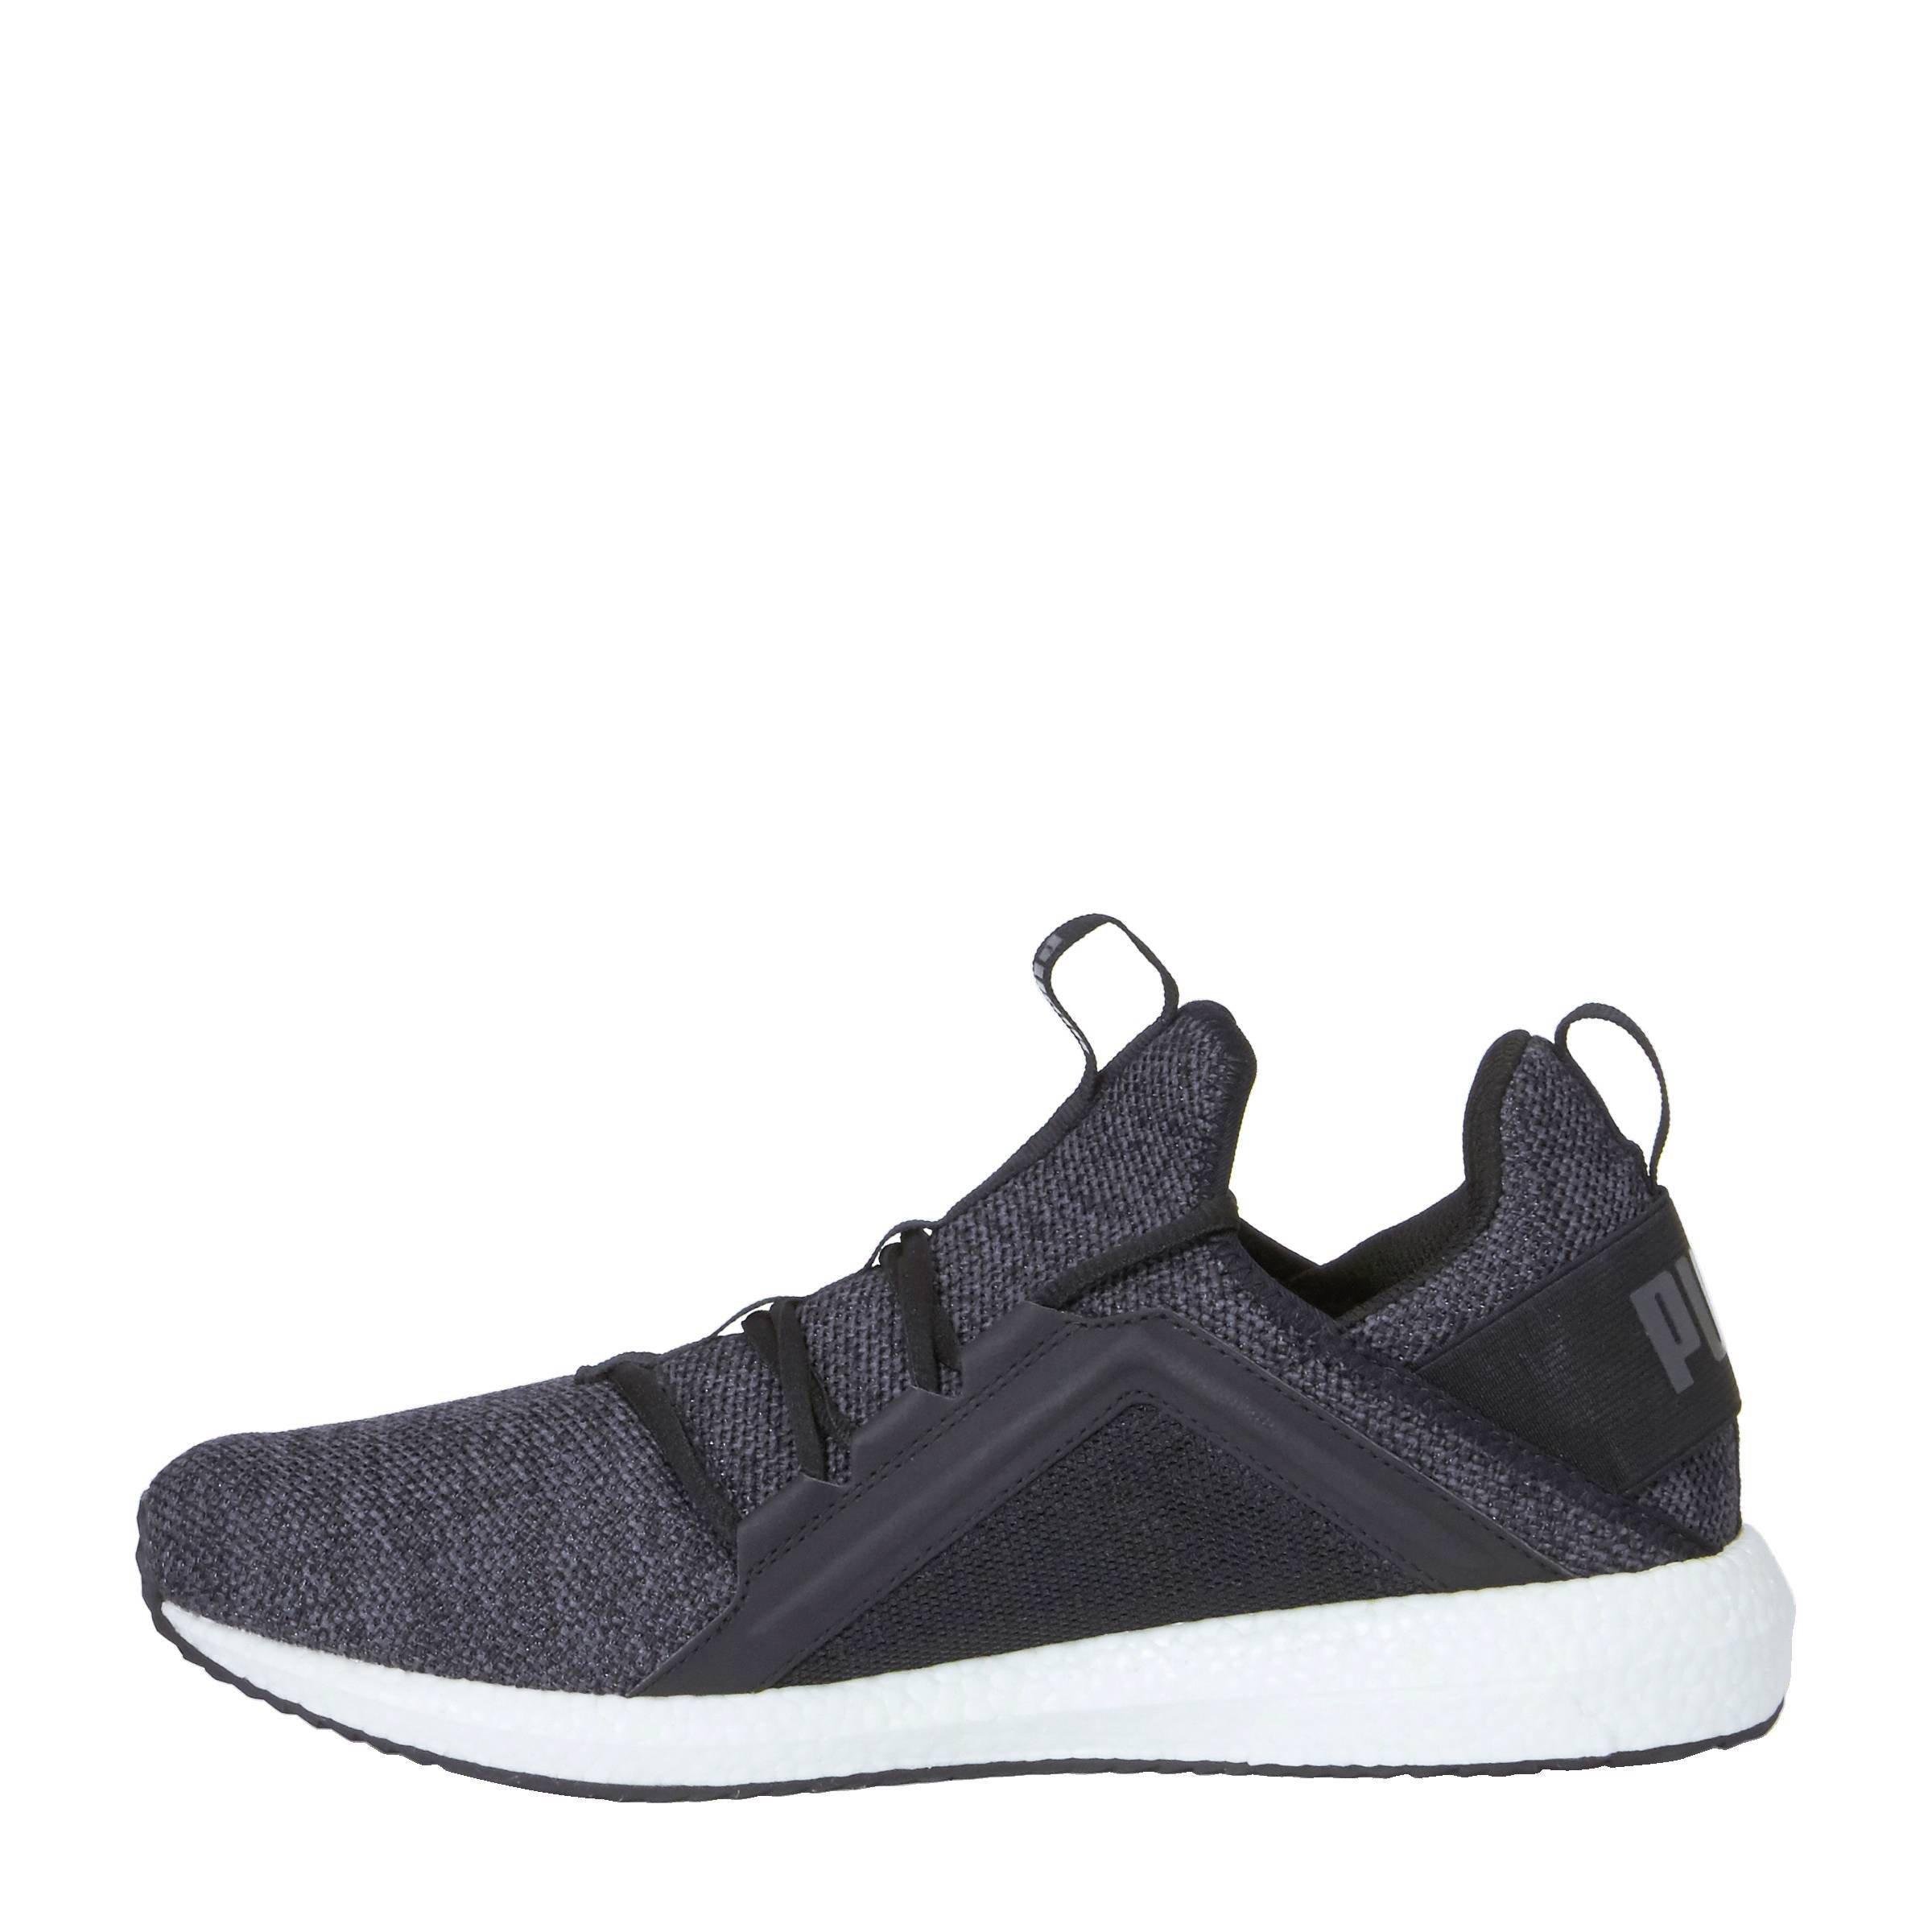 e578e029c6 puma-mega-nrgy-knit-fitness-schoenen-heren-zwart-4057828135694.jpg